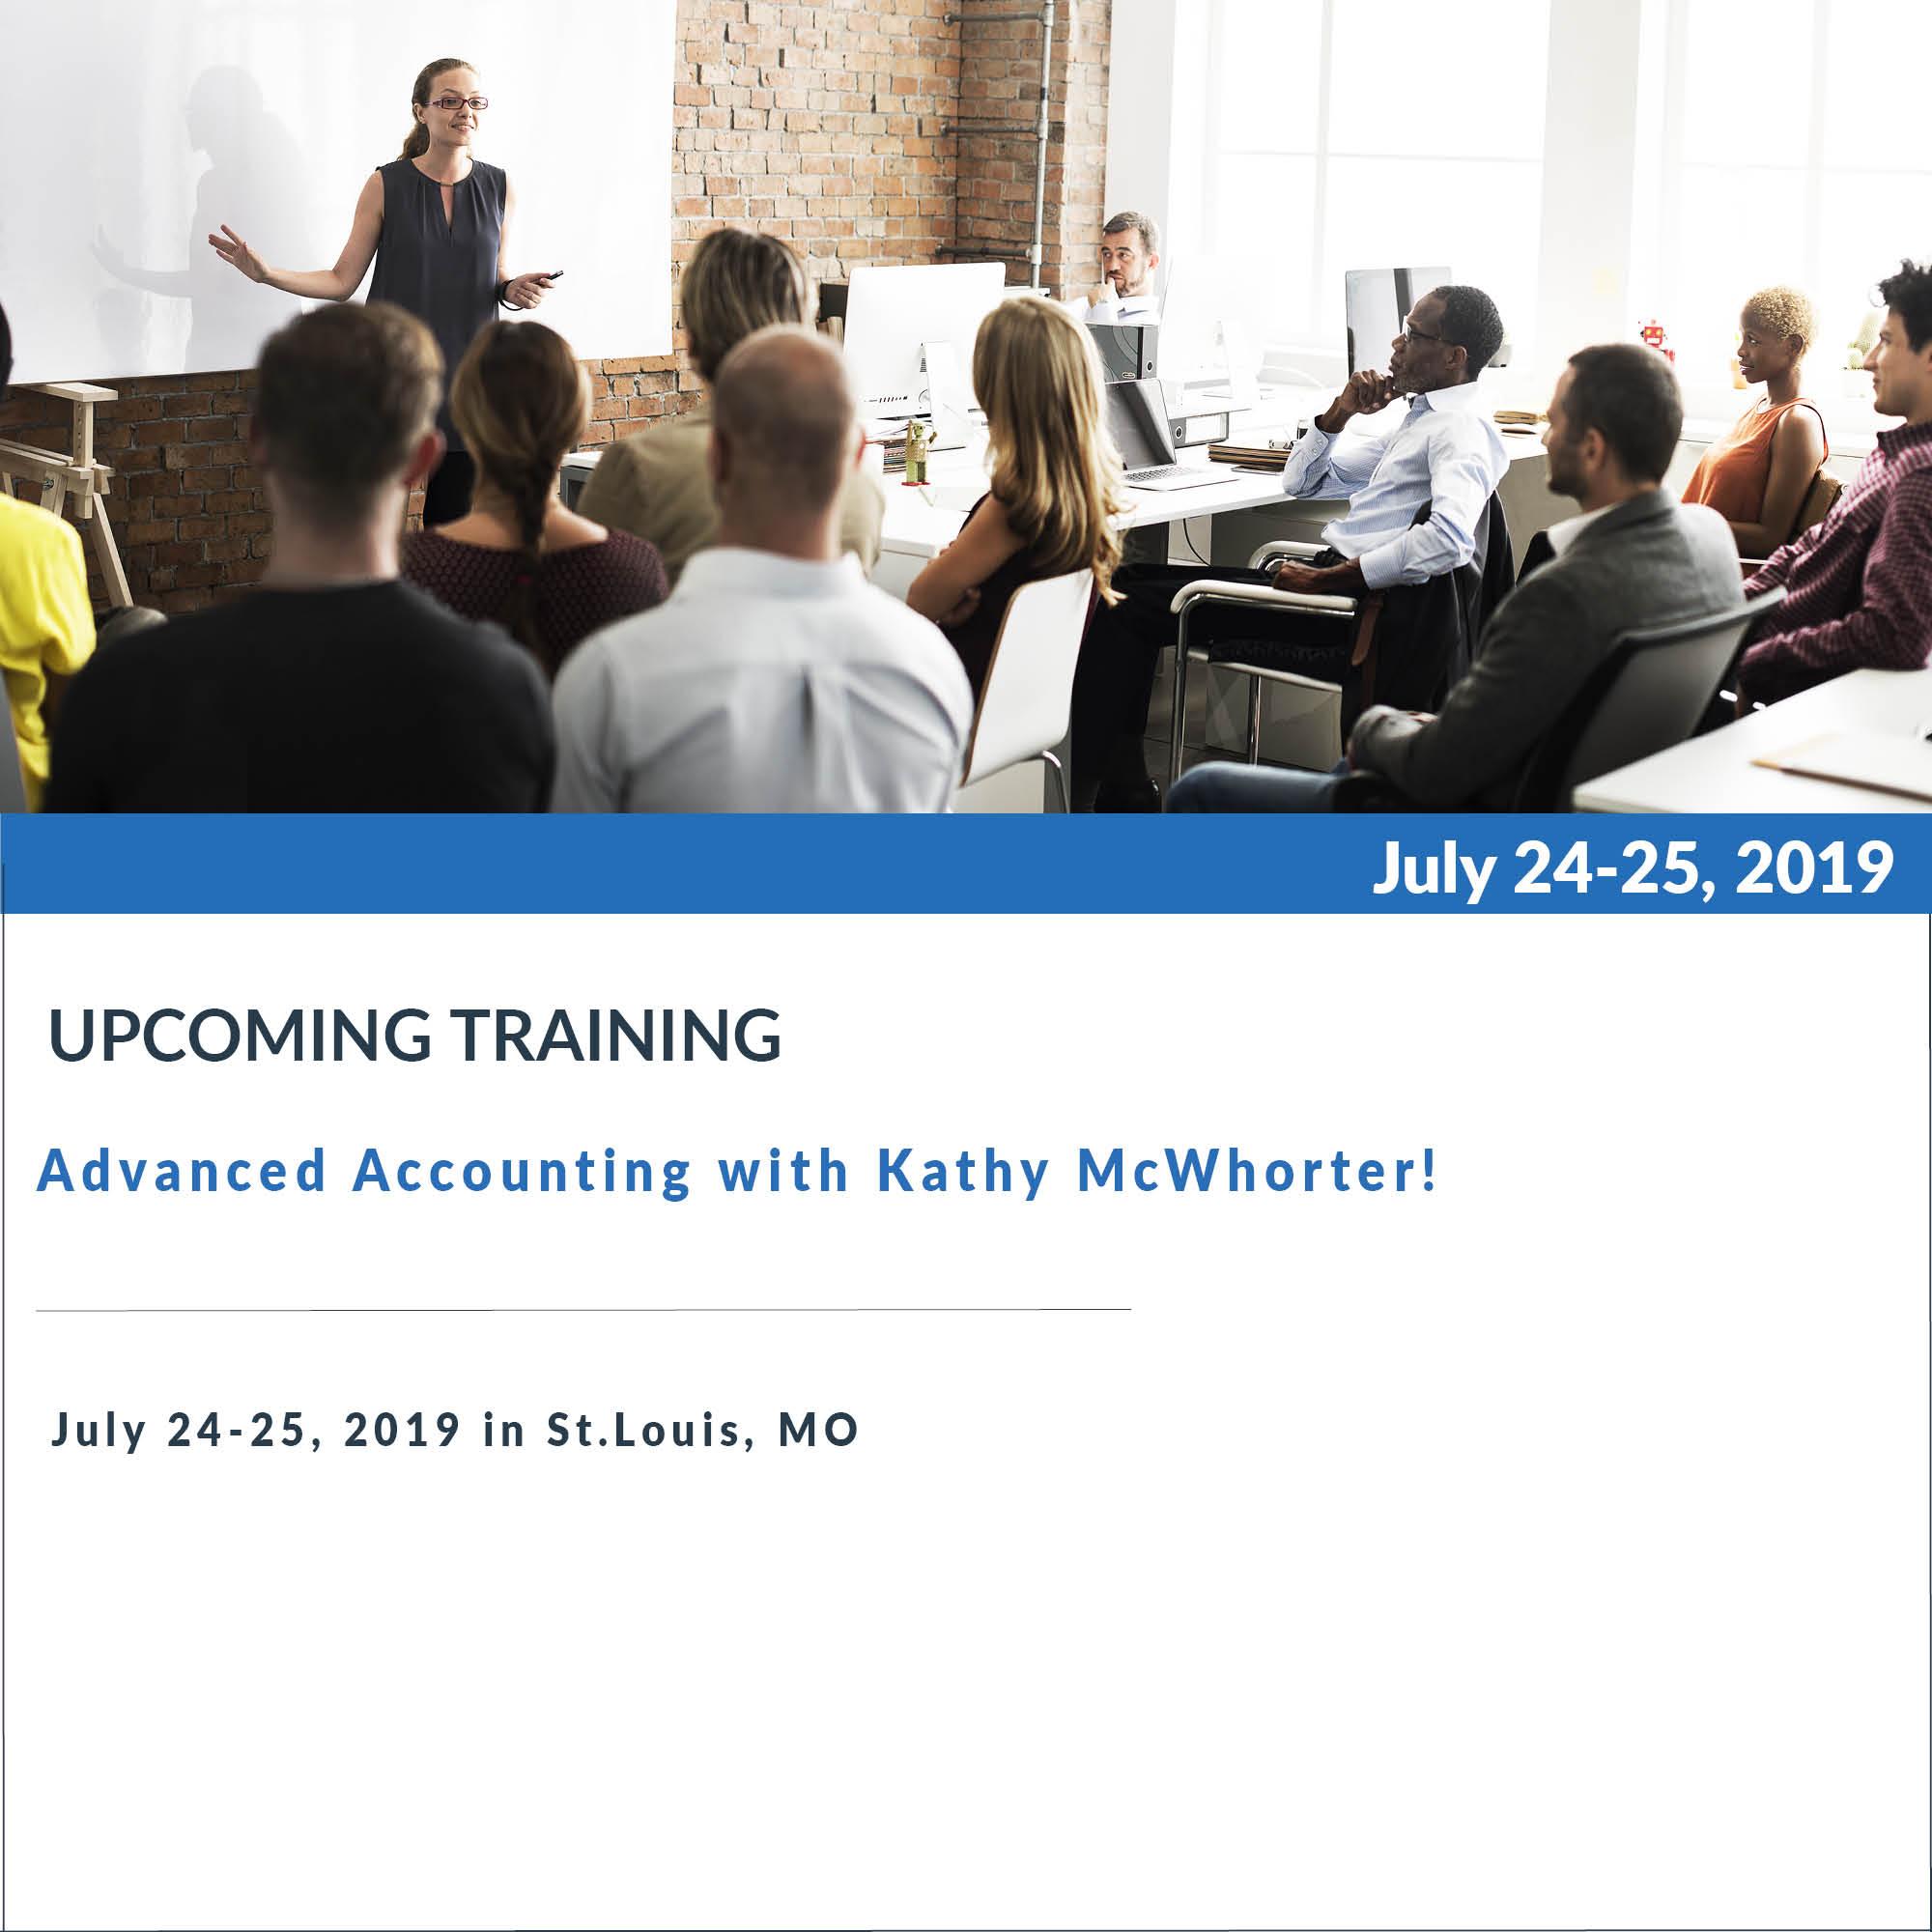 Aspire Training Image Template_July 25-25